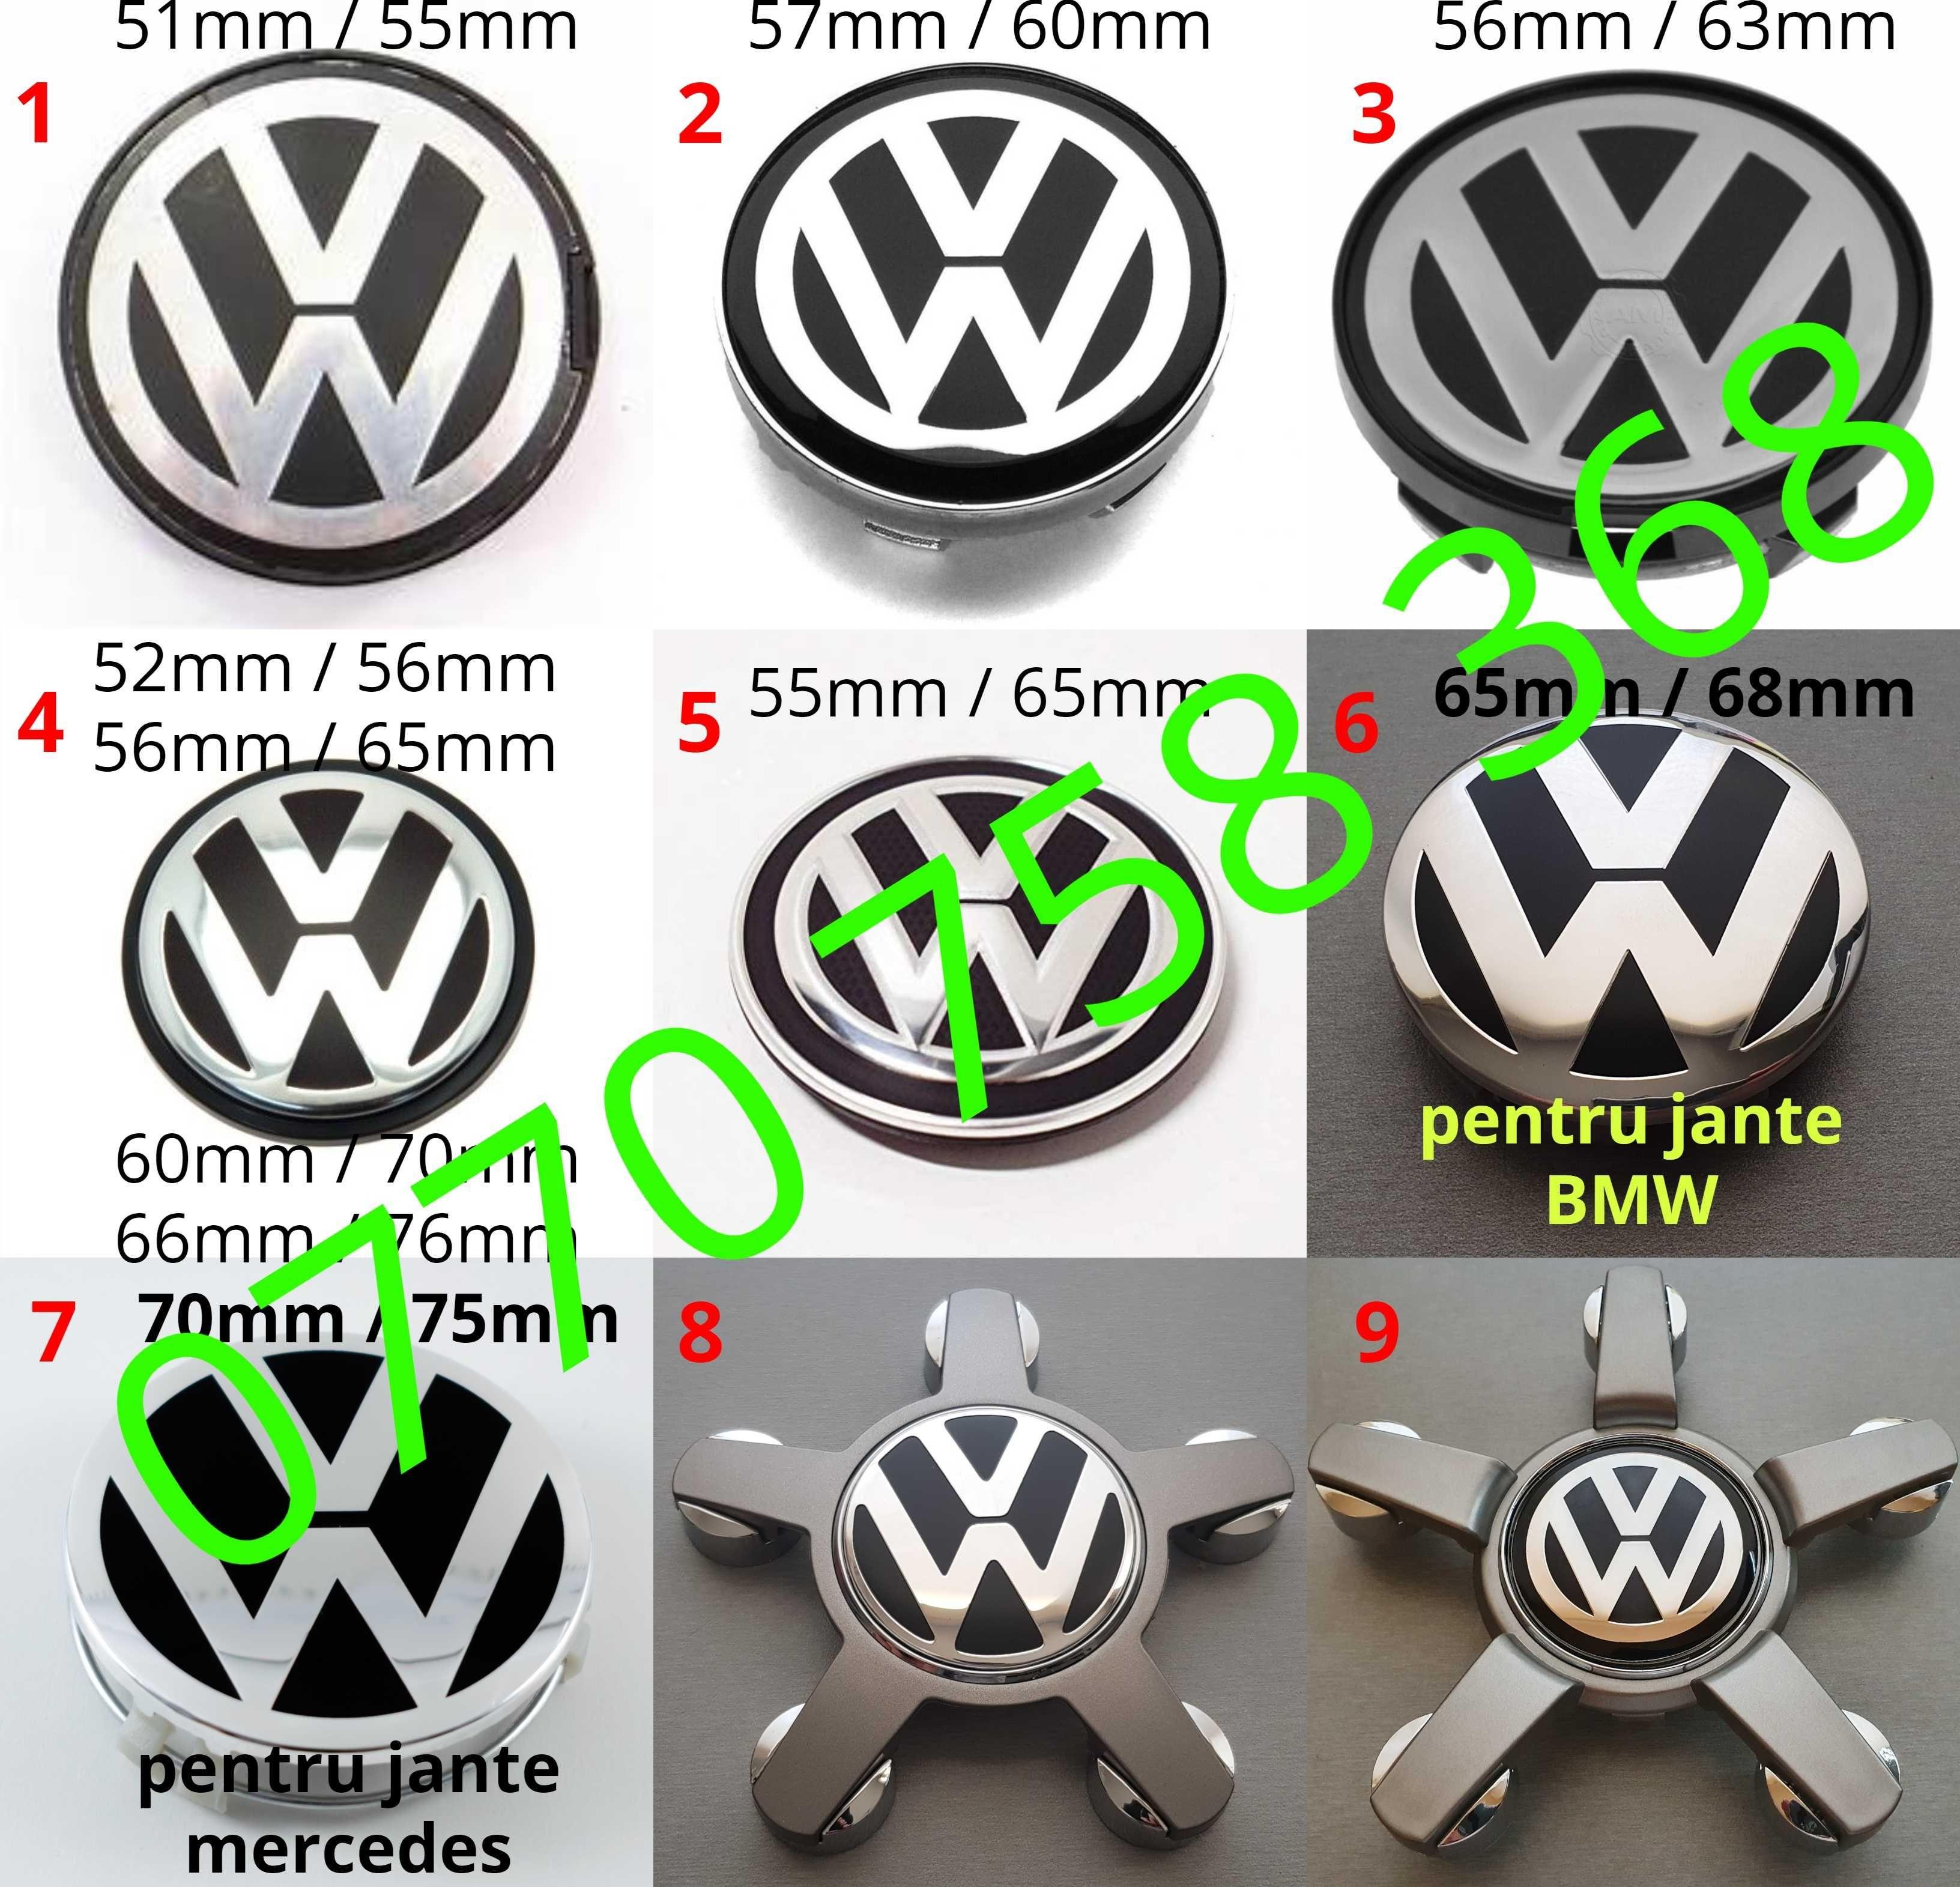 Capace roti jante aliaj Volkswagen VW Passat Golf Jetta Arteon Touareg